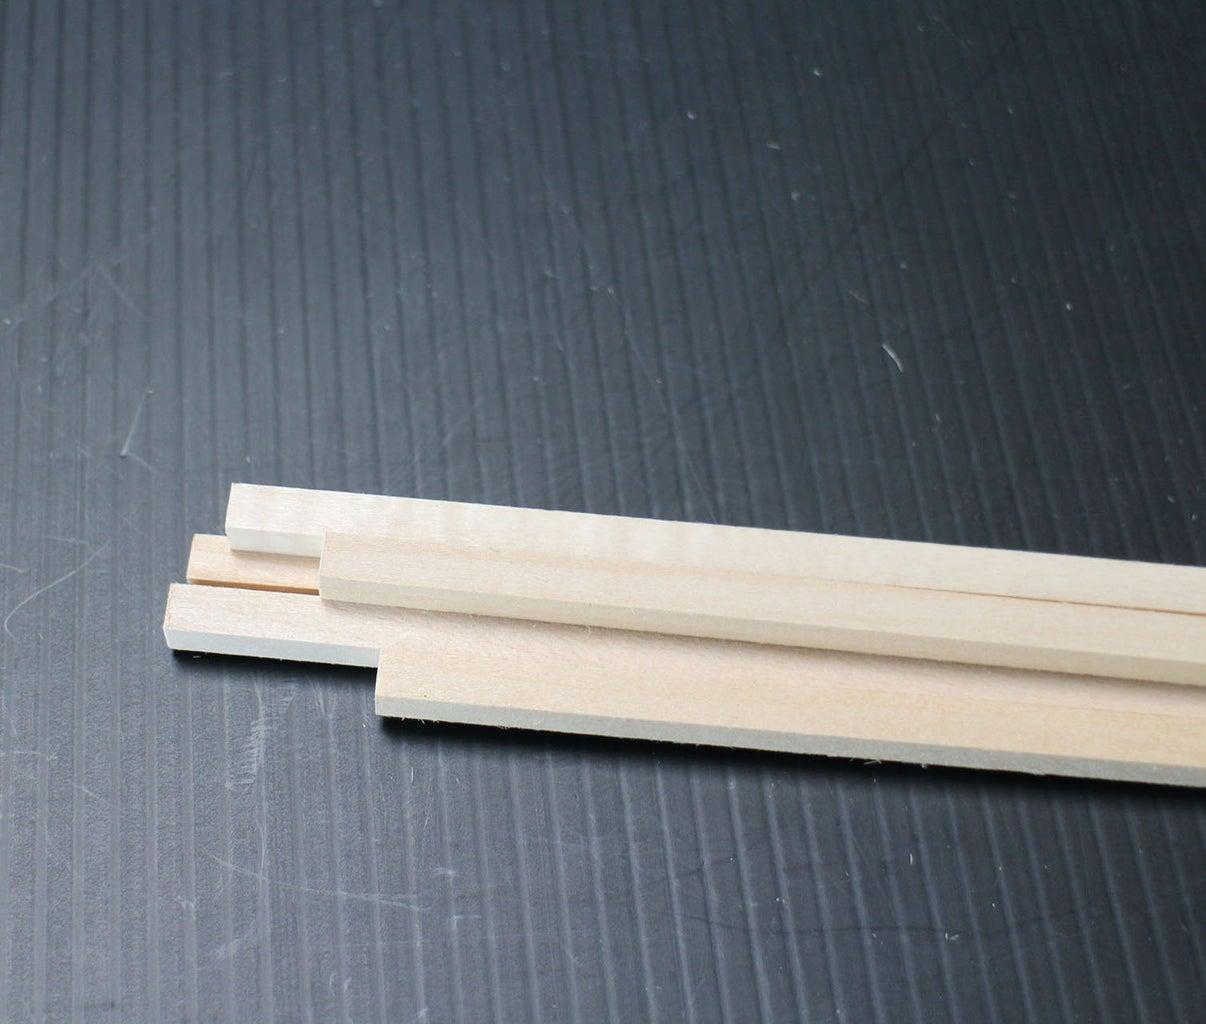 Parts and Materials